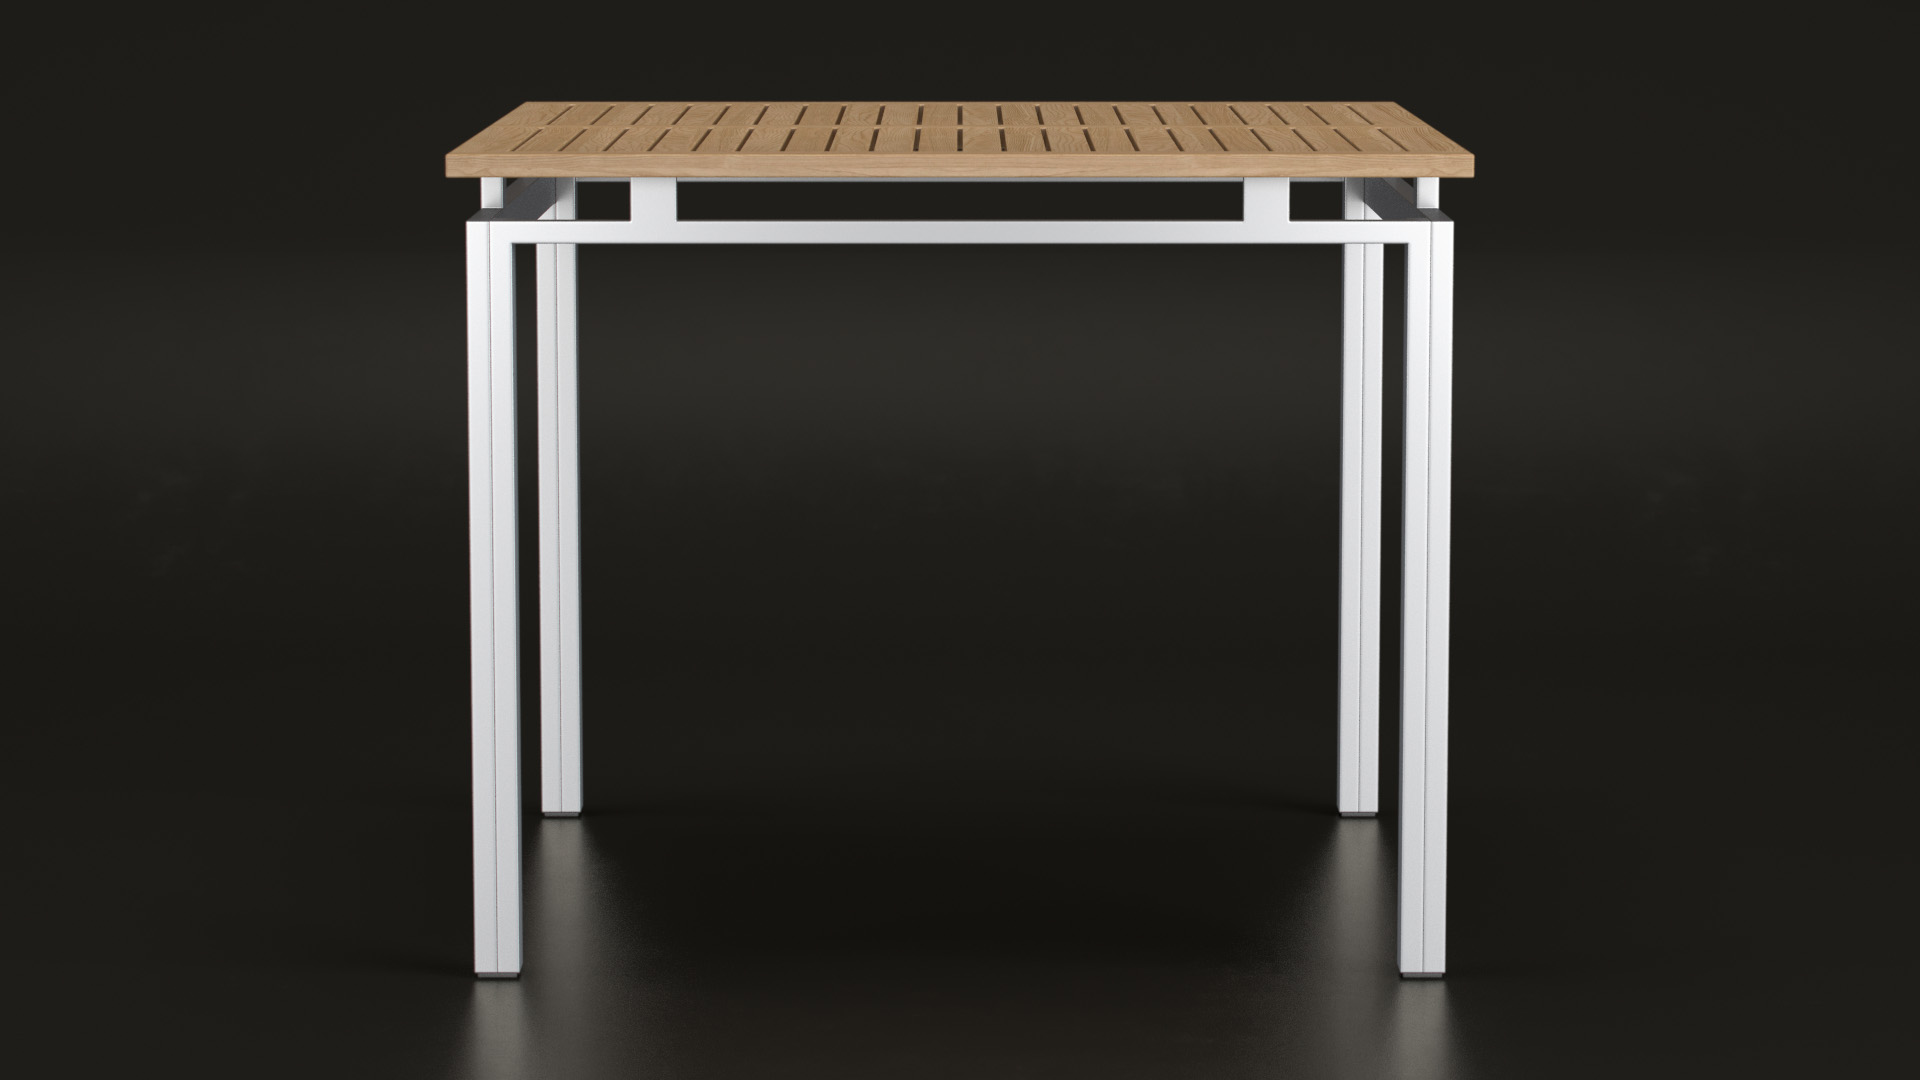 Alu_WoodGarden_Table_BlackSet_01_V1.01_0001